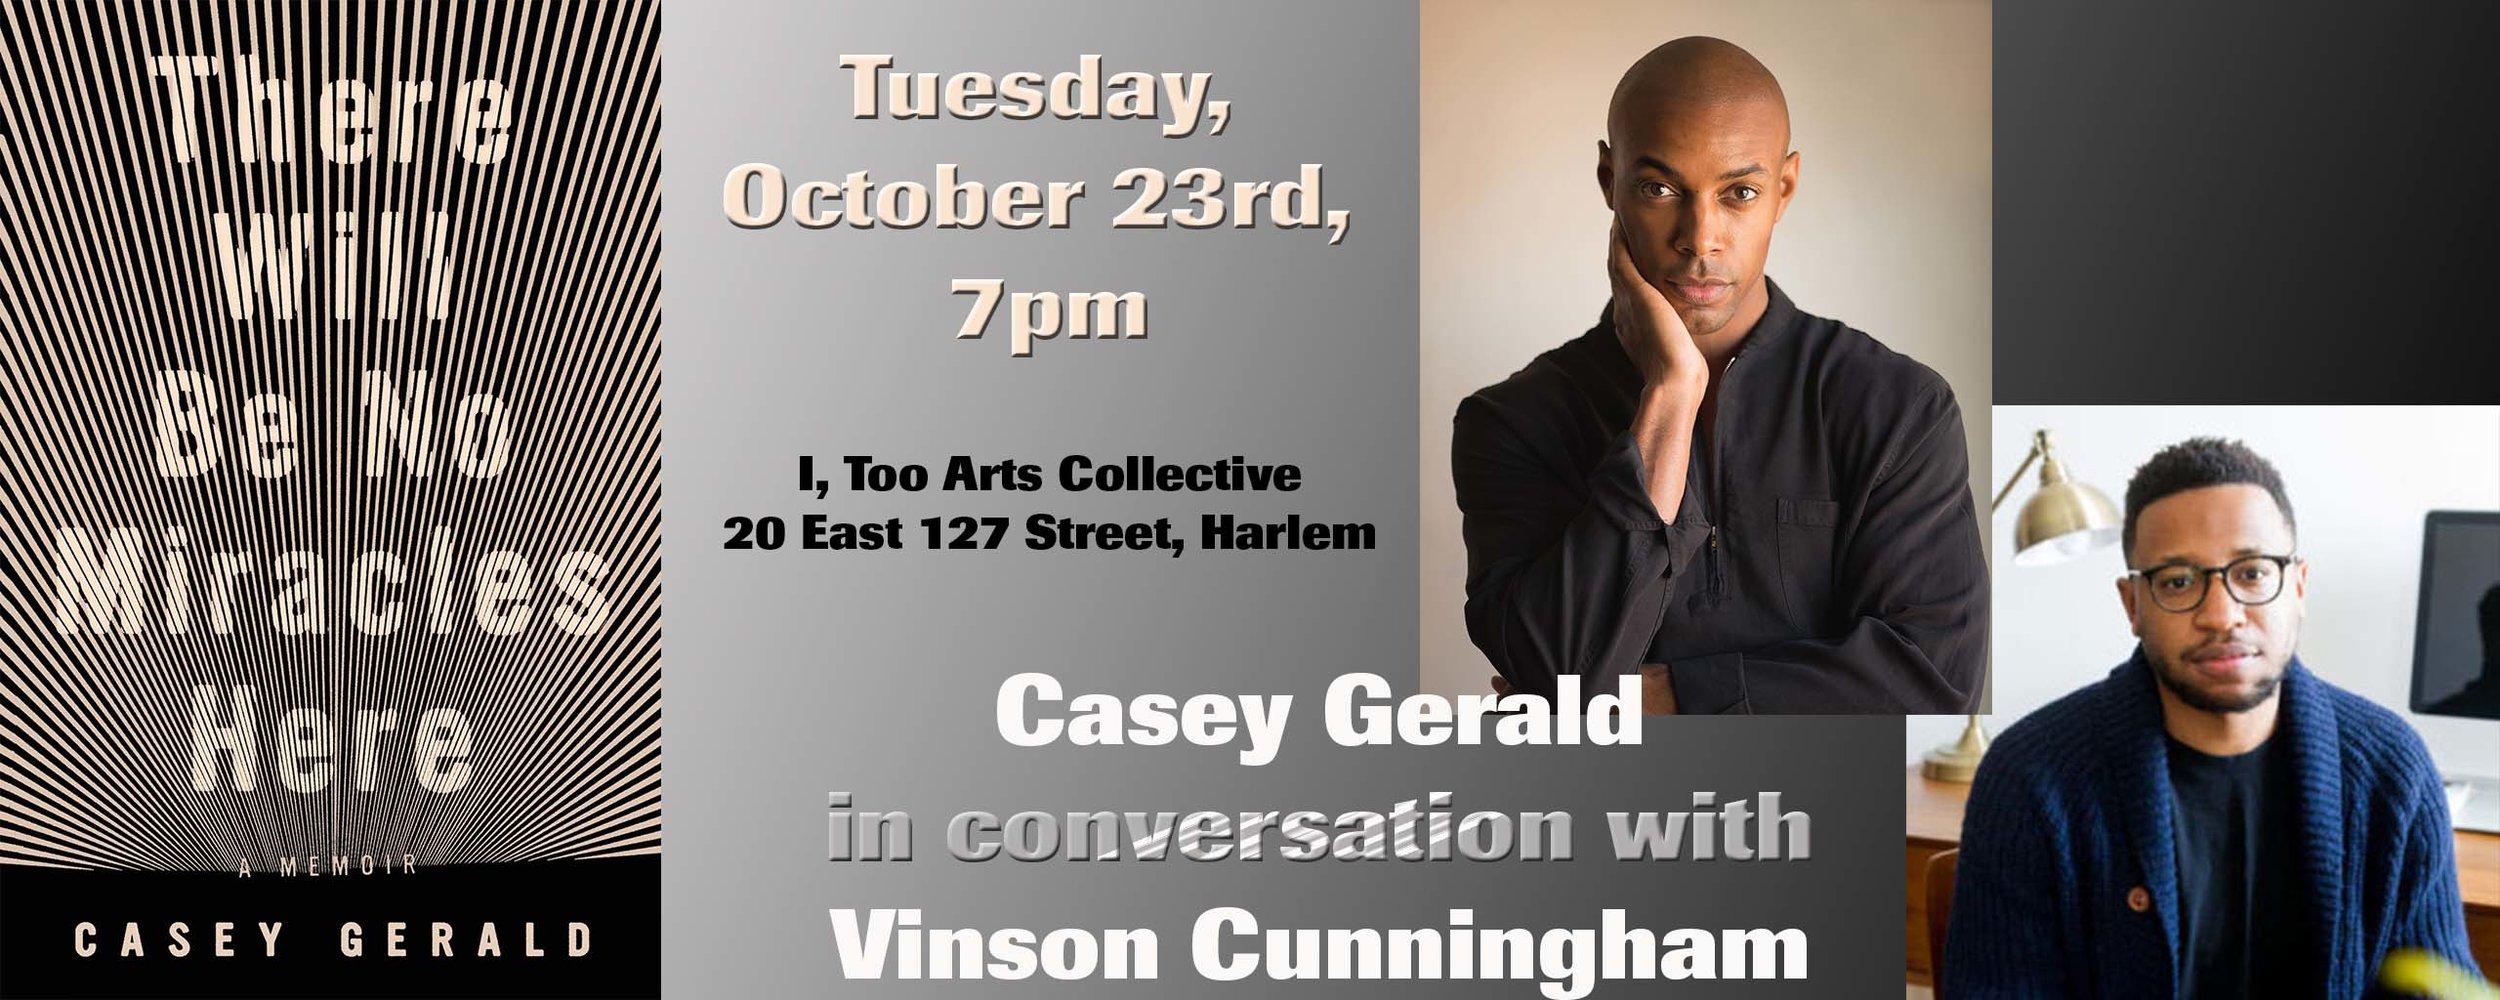 Casey Gerald Event.jpg